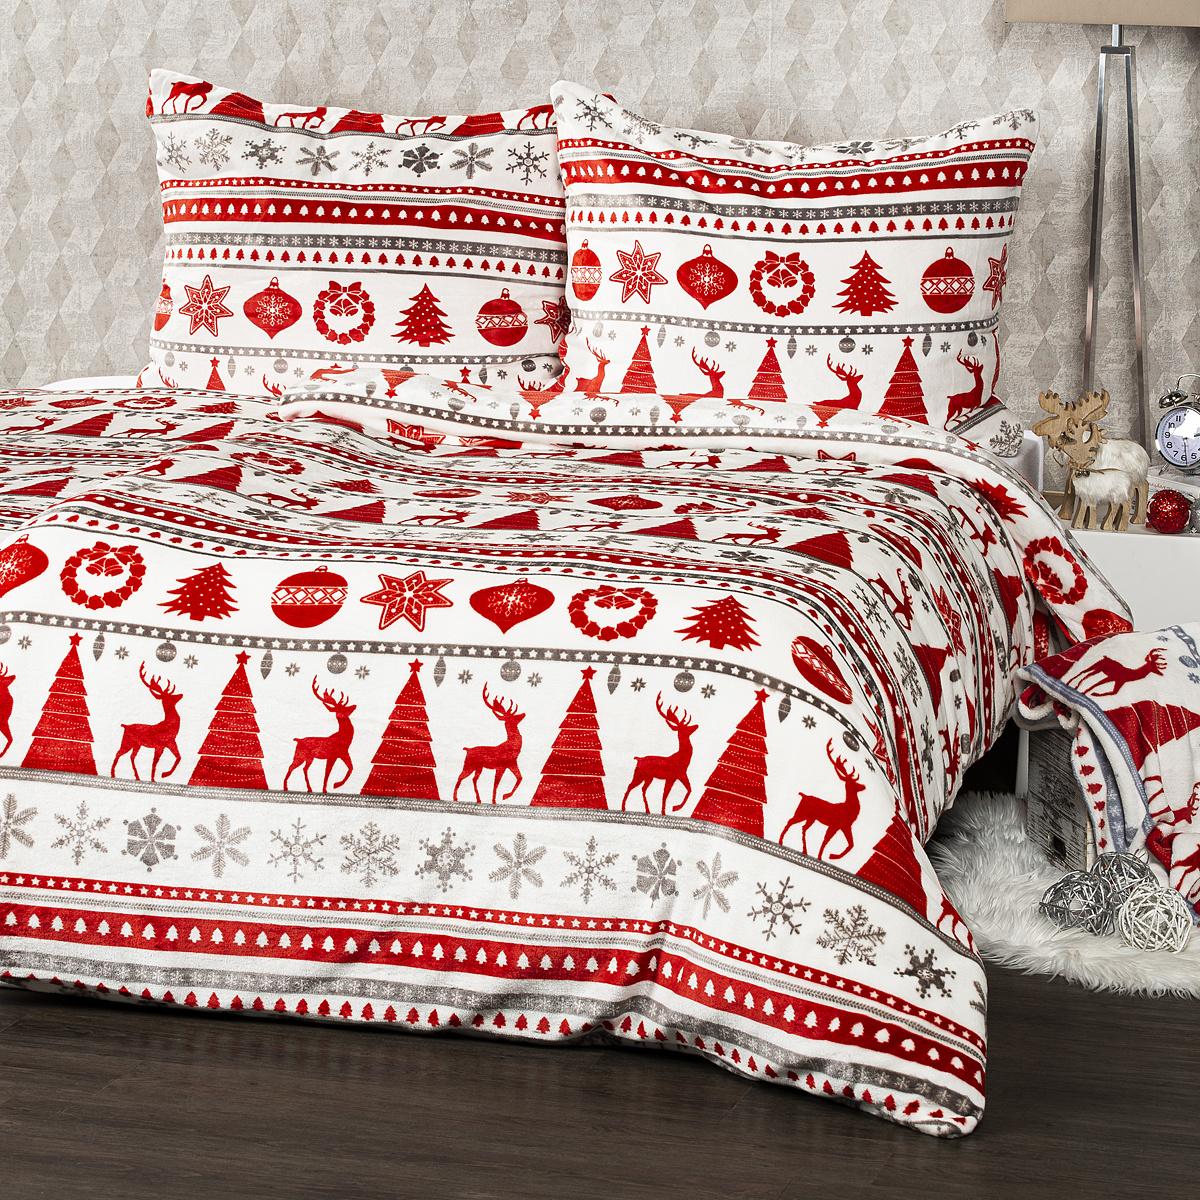 4Home Povlečení mikroflanel Christmas Time červená, 140 x 220 cm, 70 x 90 cm